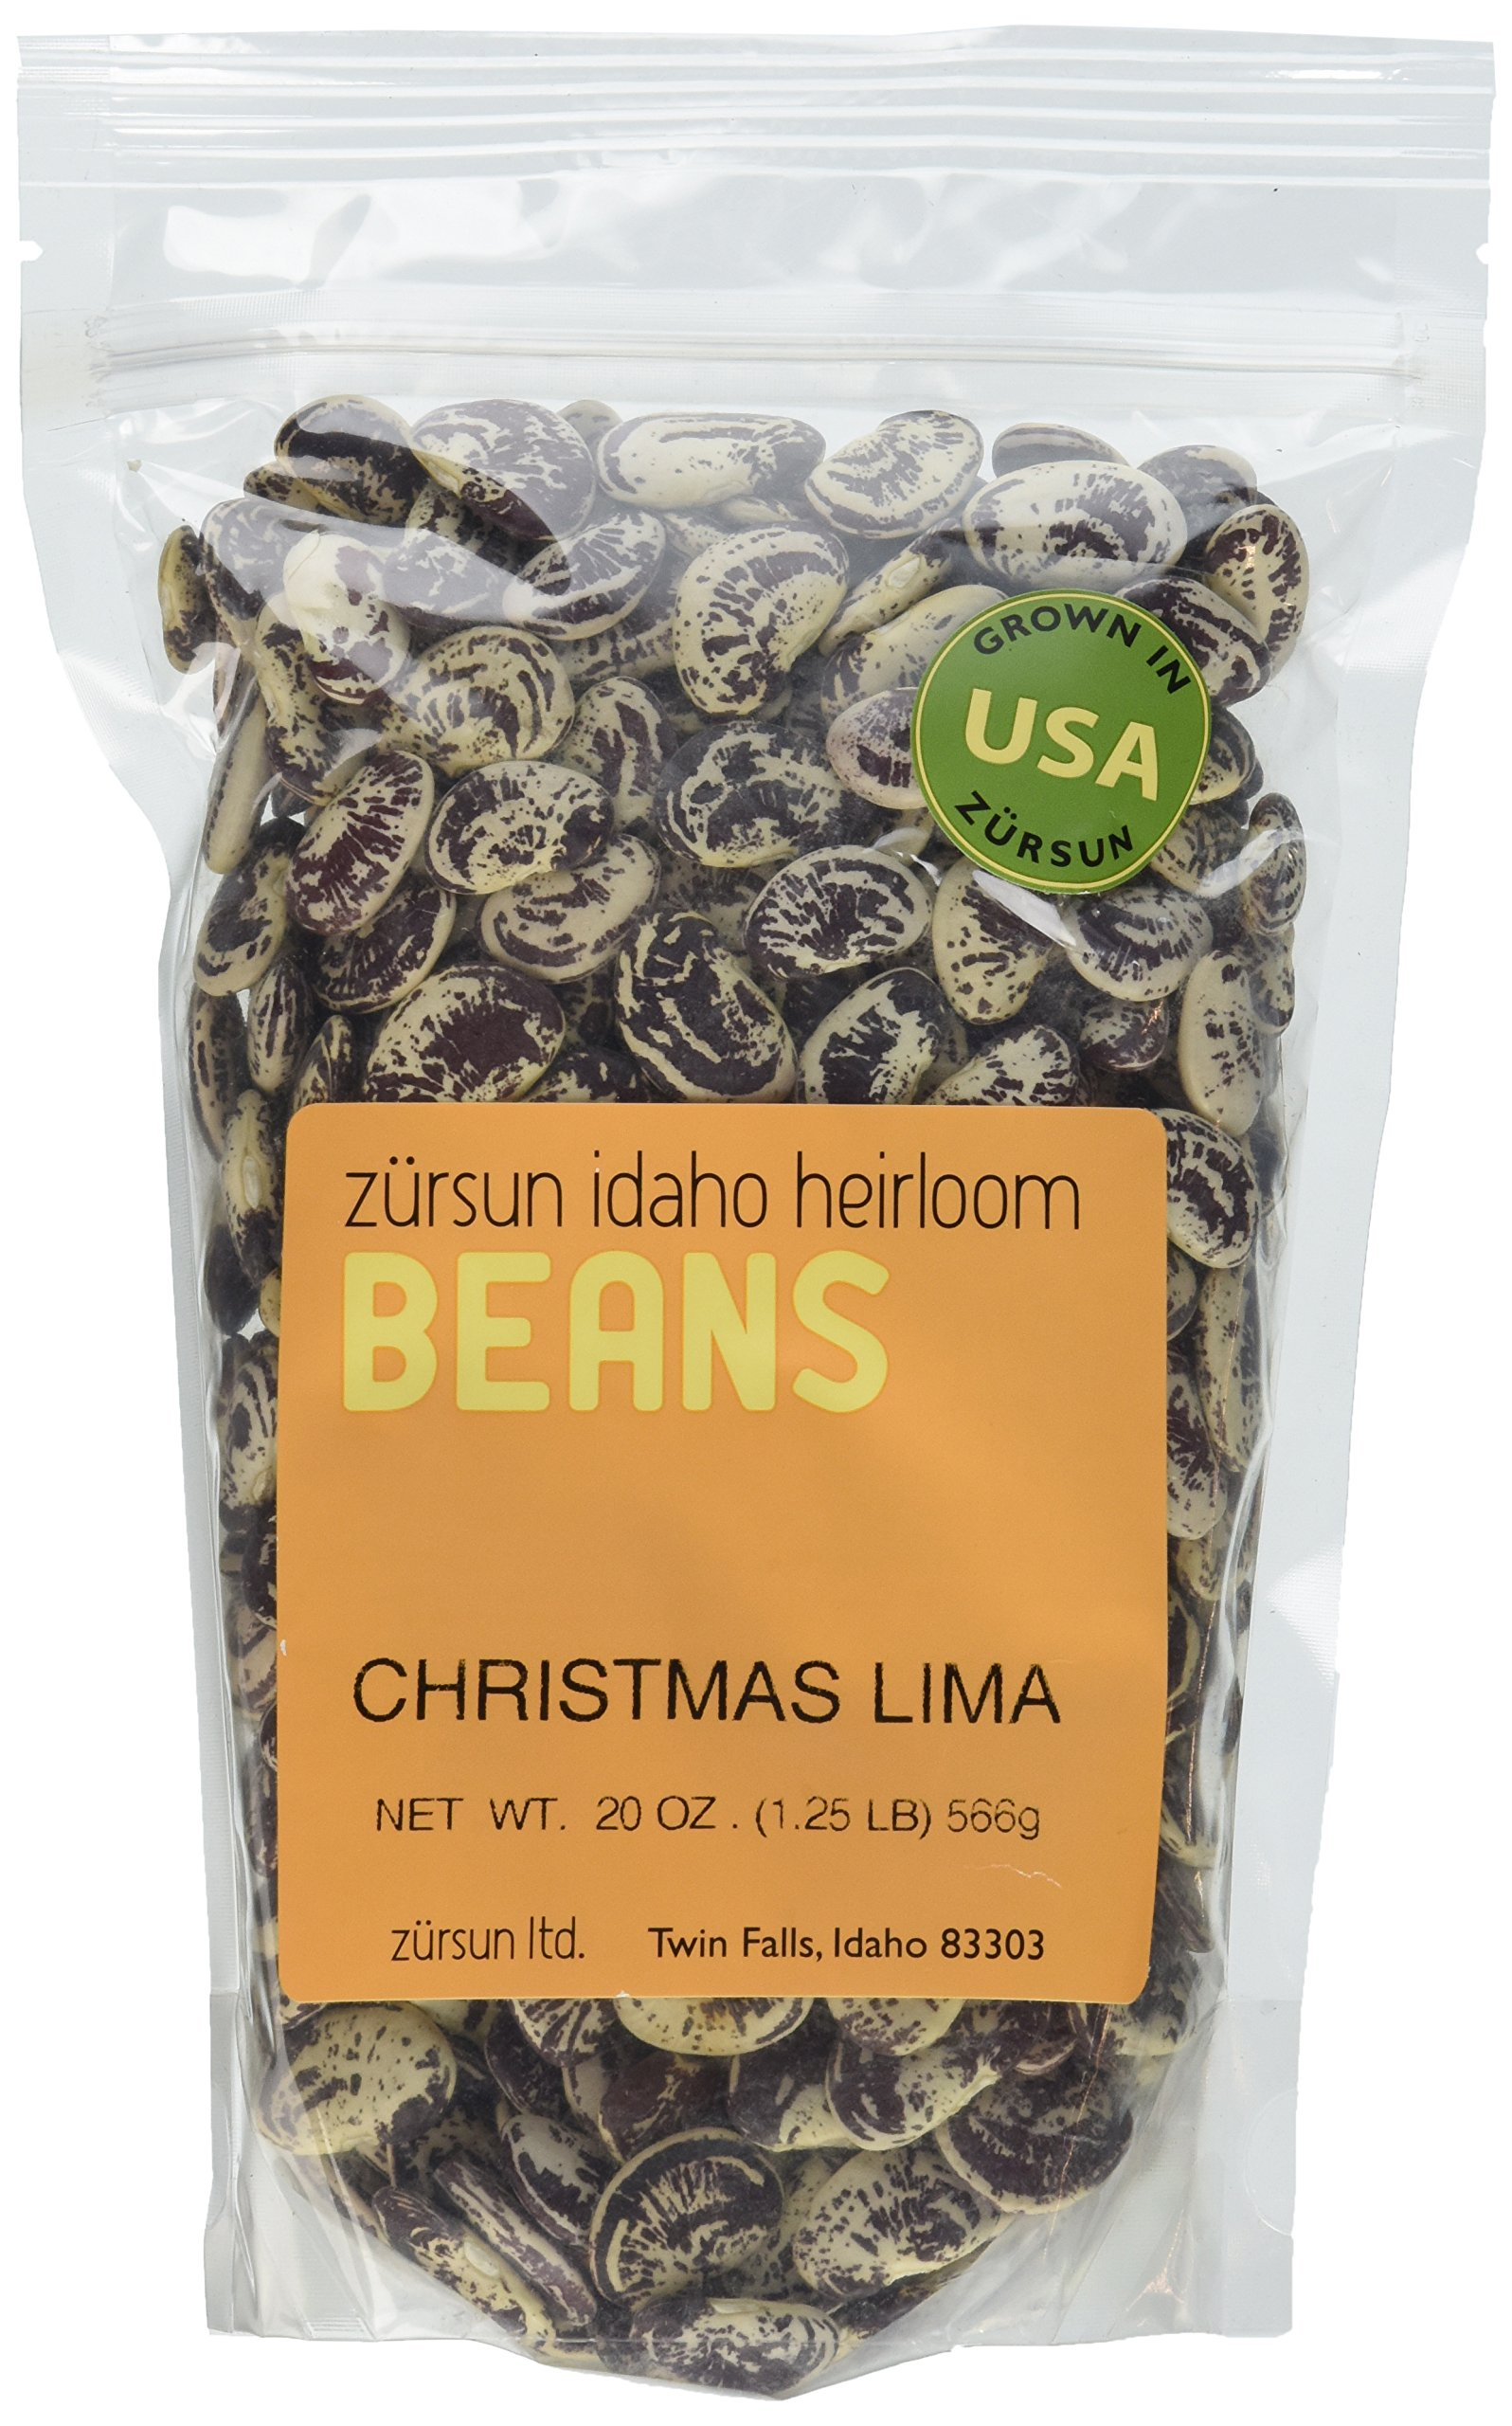 Heirloom Christmas Lima Beans Idaho Pack of 2 566 g 20 oz each by Zursun Ltd.